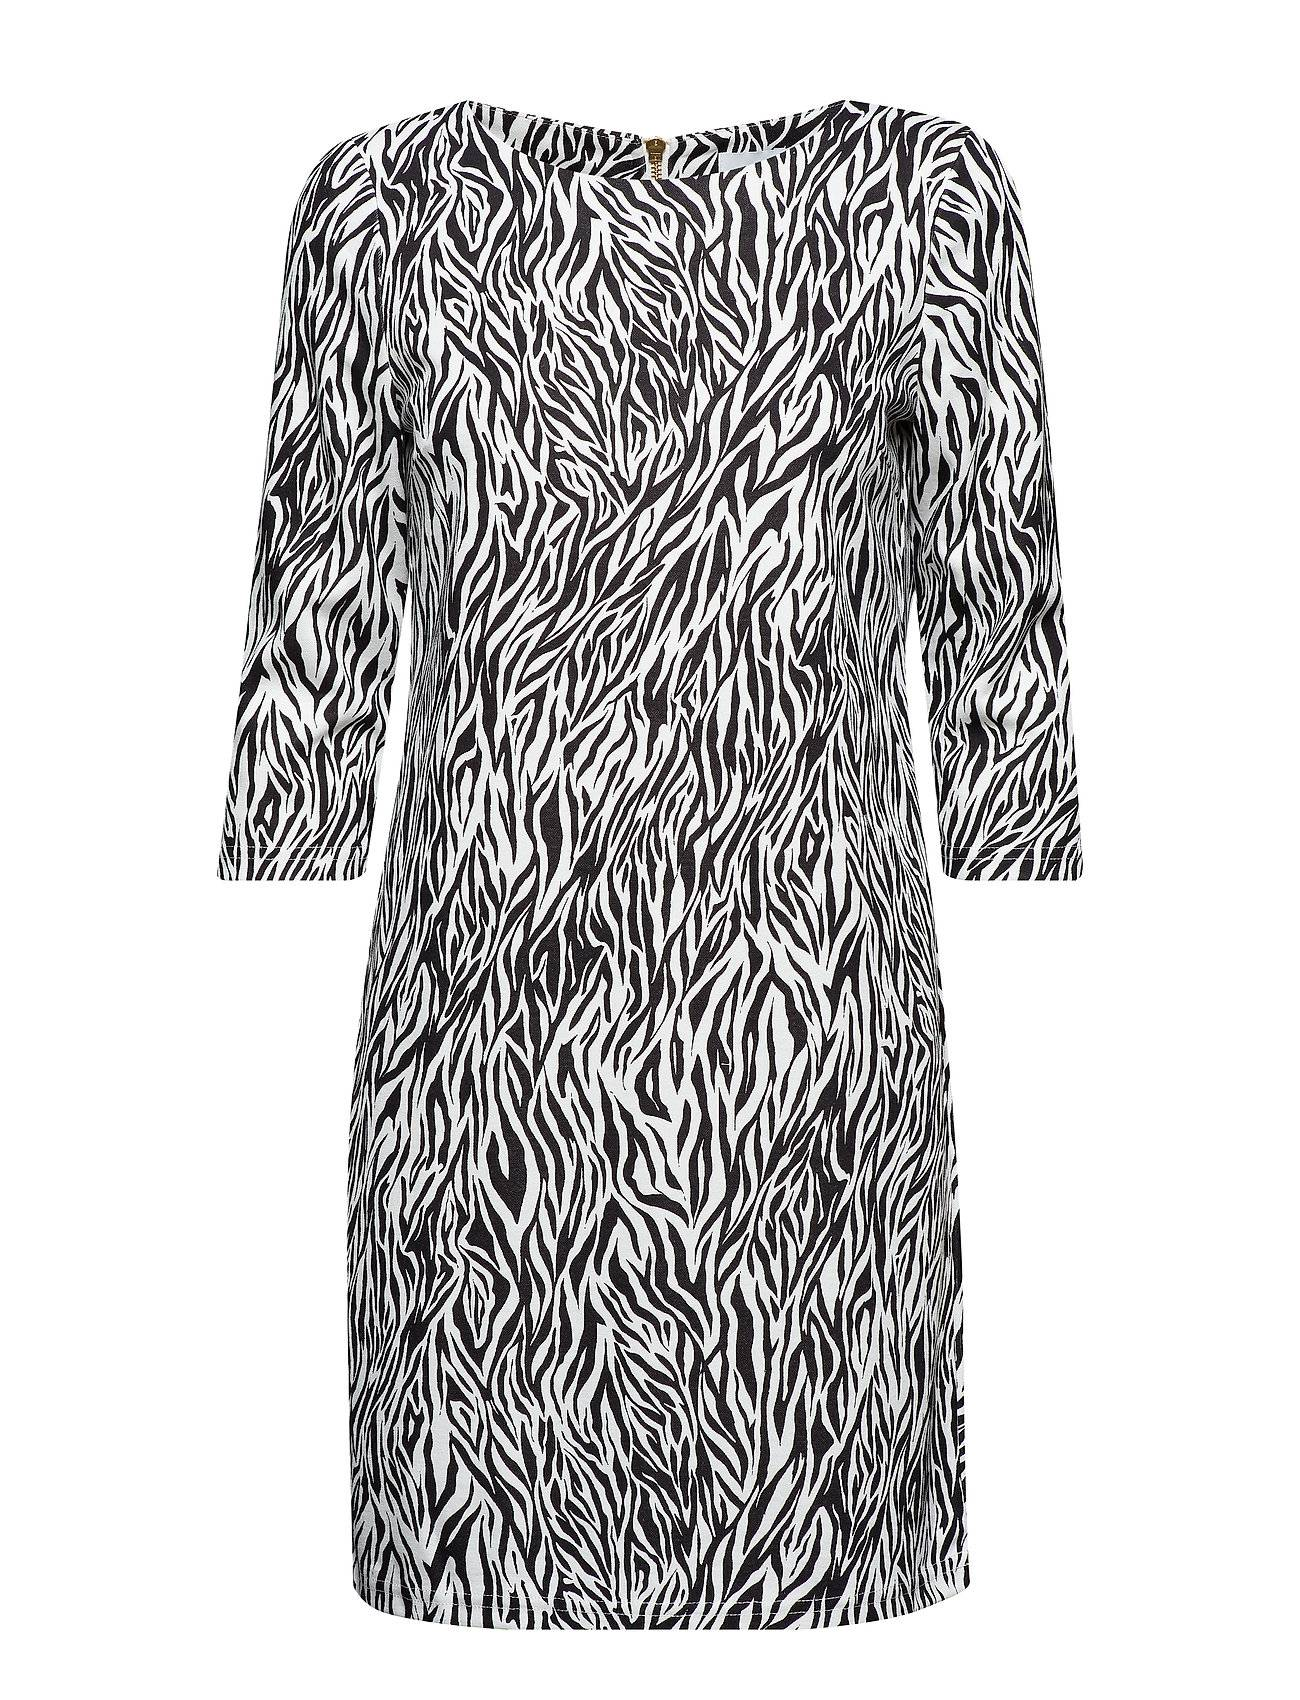 Image of VILA Vitinny New Dress - Lux Lyhyt Mekko Harmaa VILA